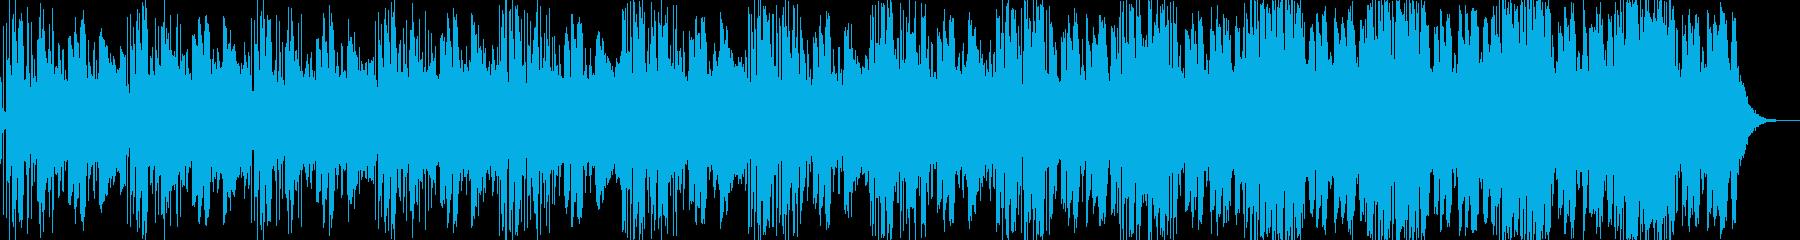 EDM 今風ダンスです。の再生済みの波形